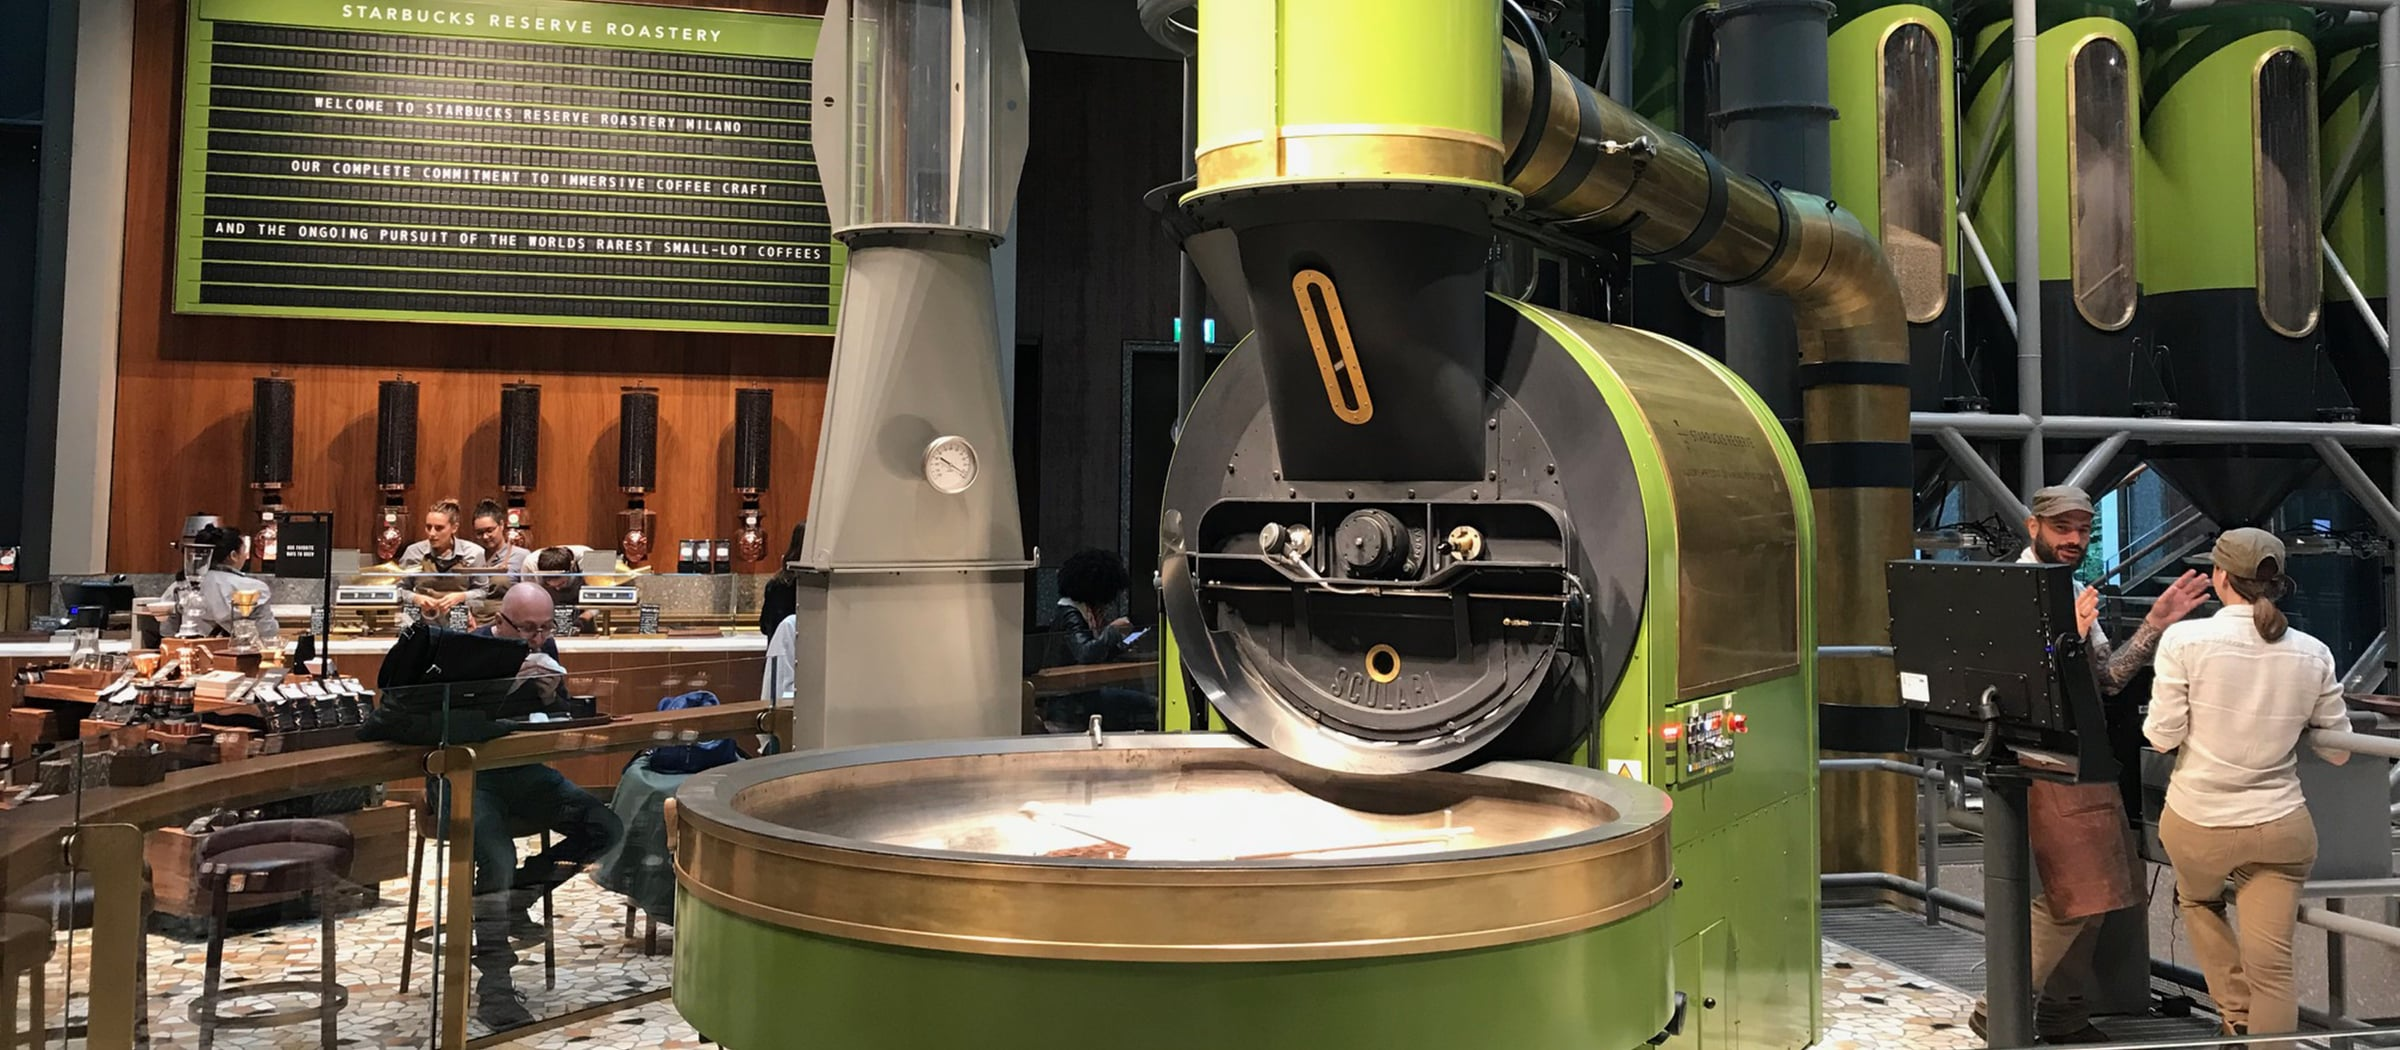 Pistor Inpiration Starbucks Italien Mailand Kaffee Maschine